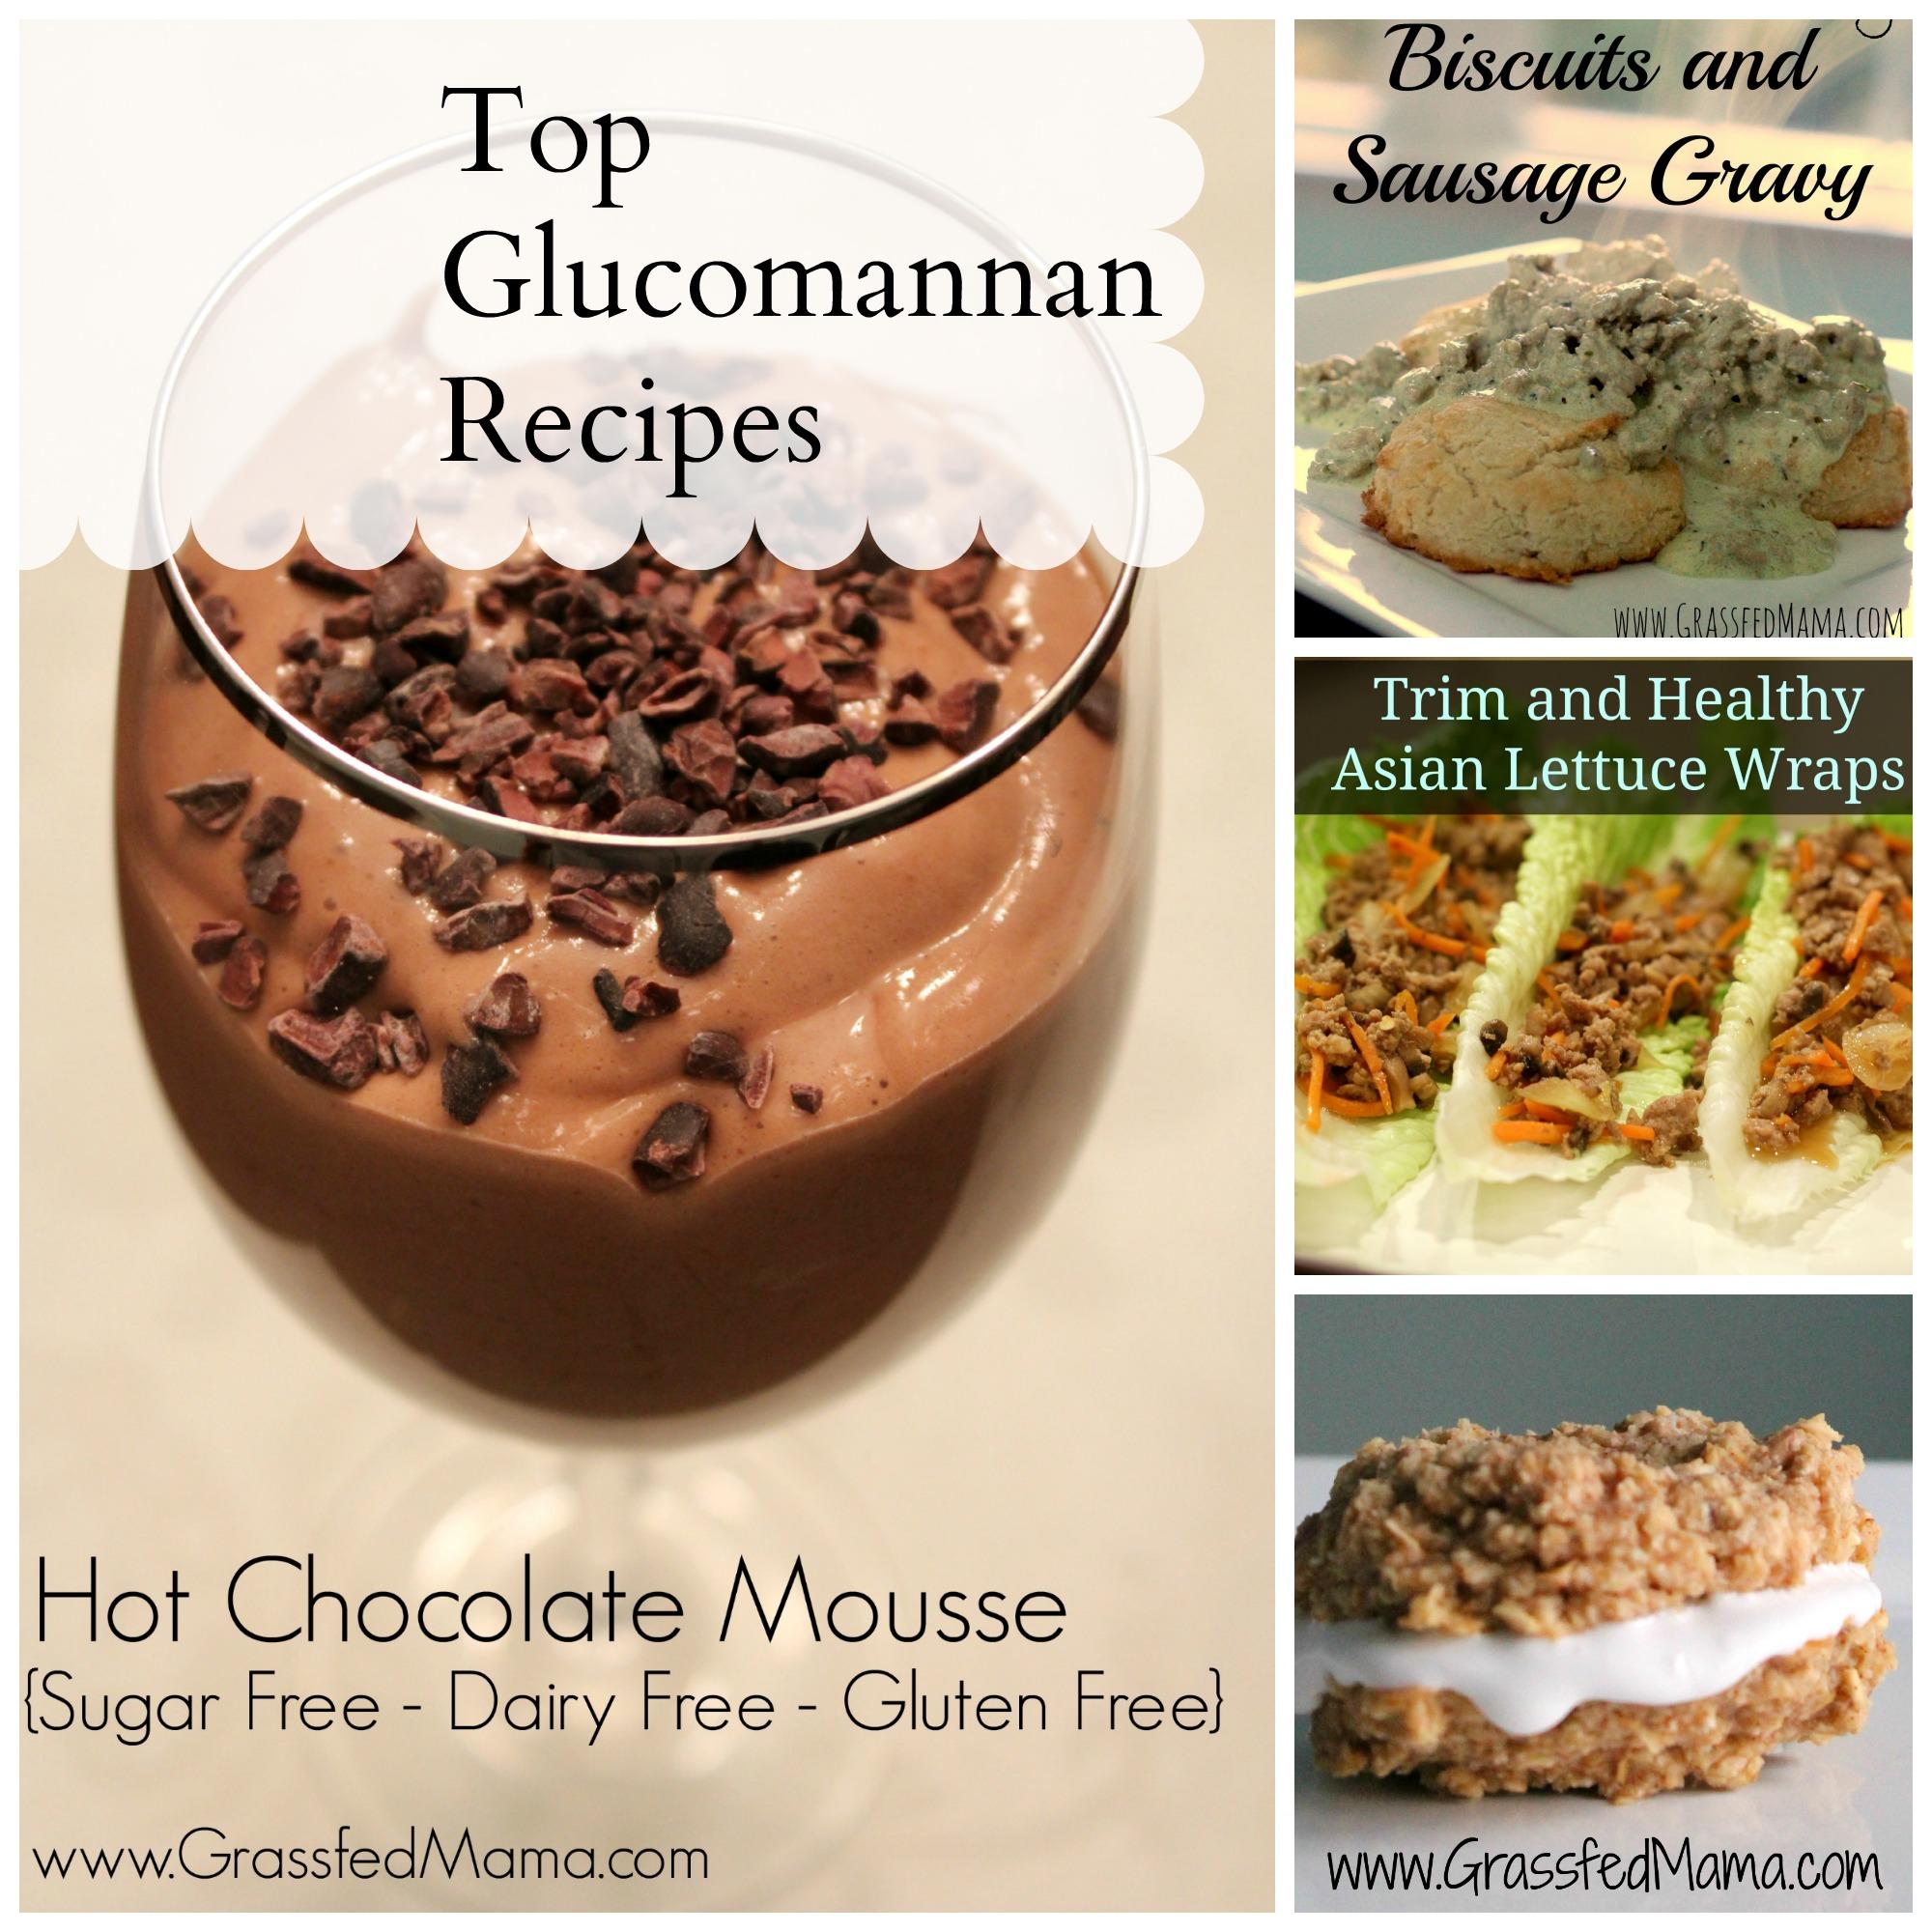 Top glucomannan recipes